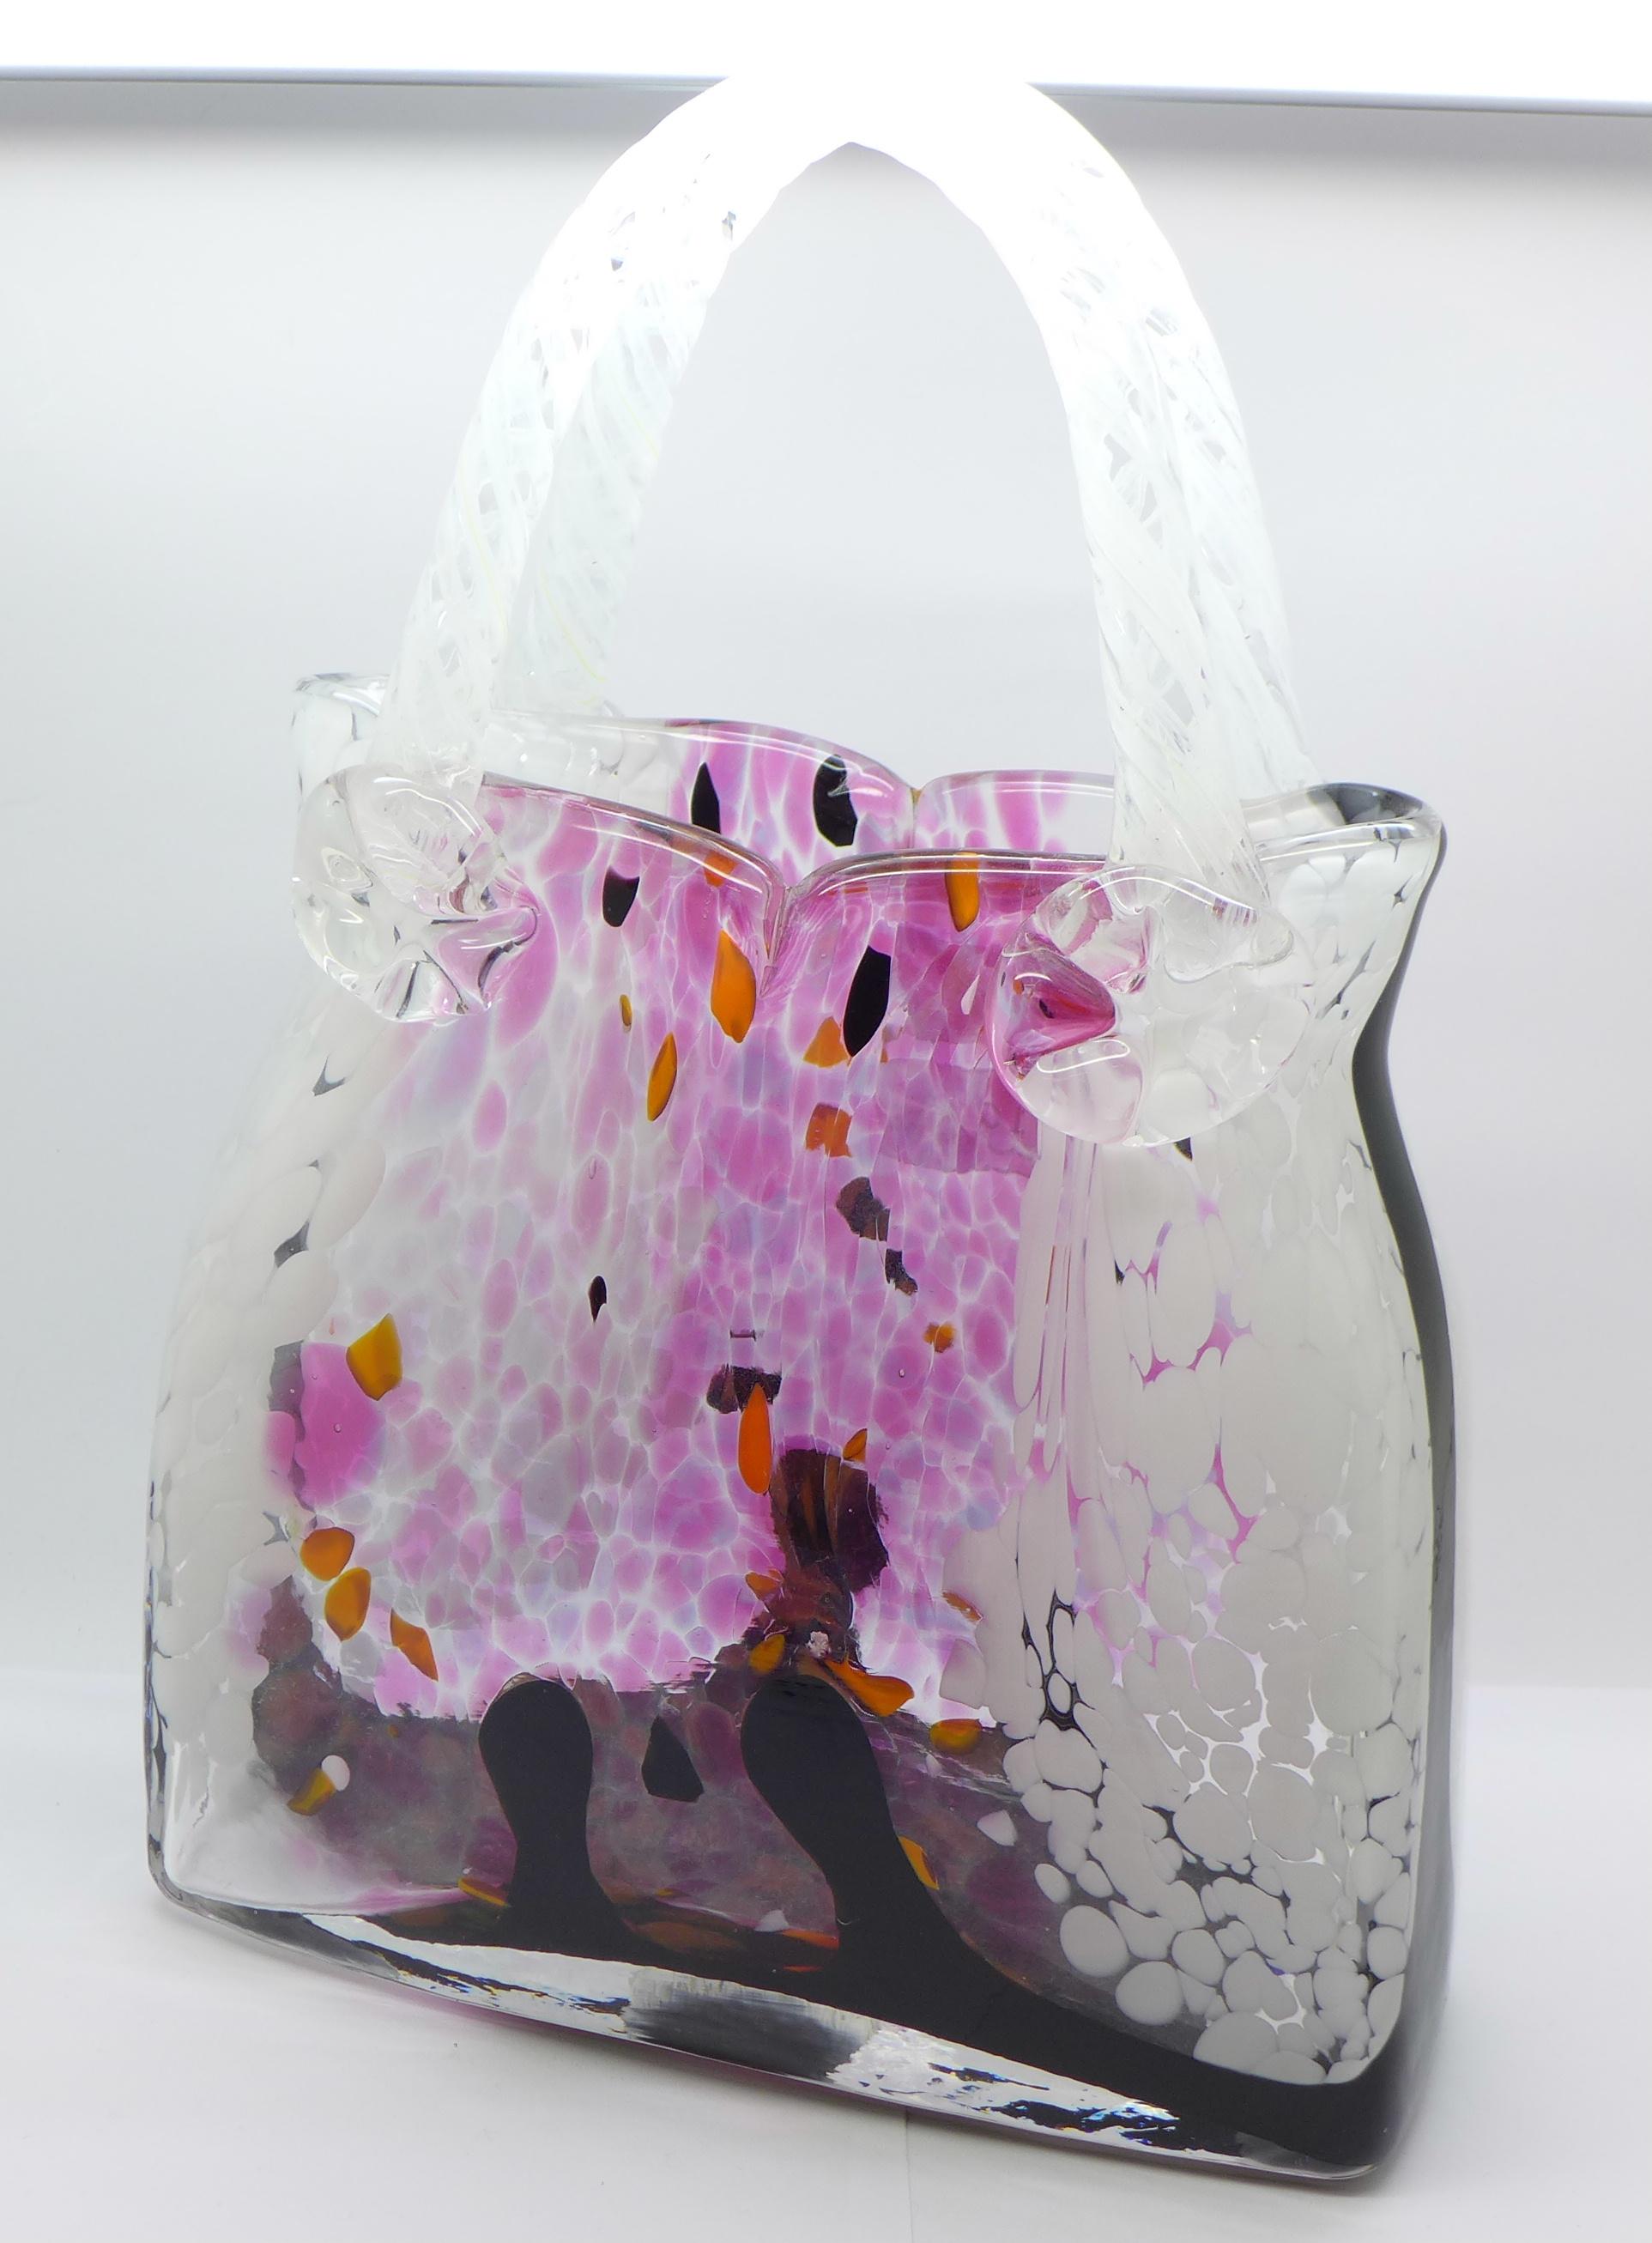 Lot 610 - A Murano glass handbag vase, 31.